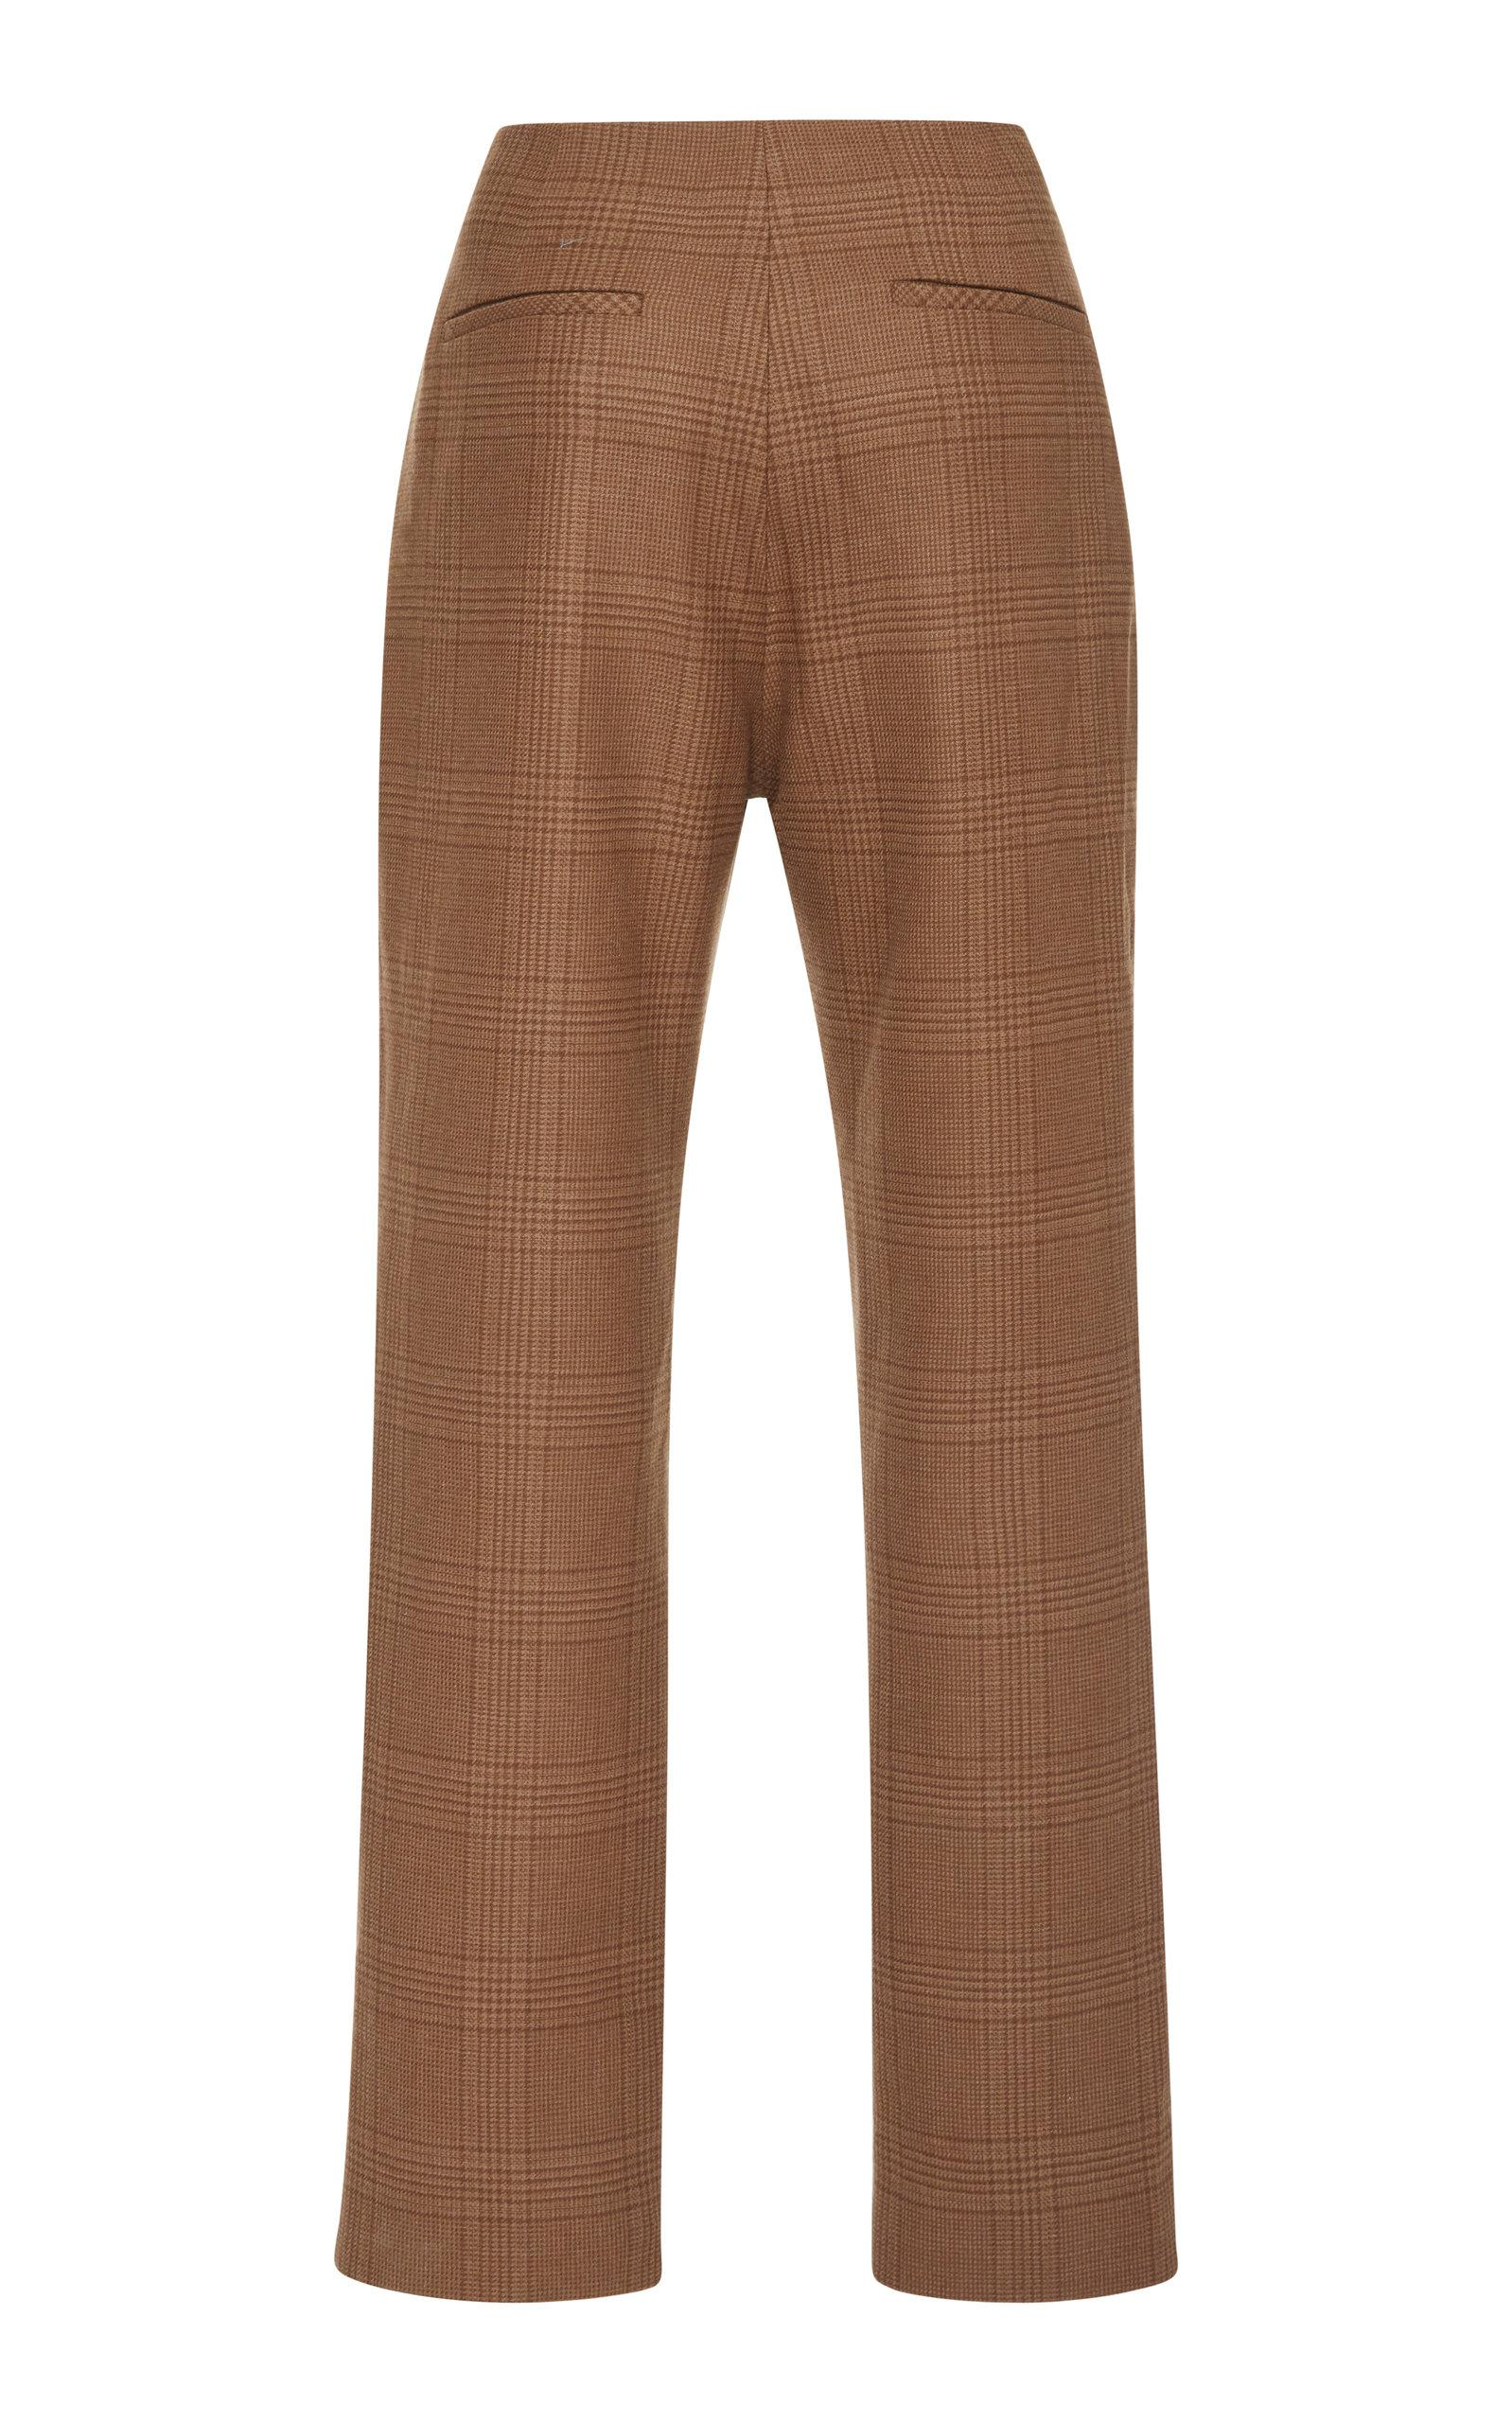 Jonathan Simkhai Cropped Checked Wool Slim-leg Pants in Brown